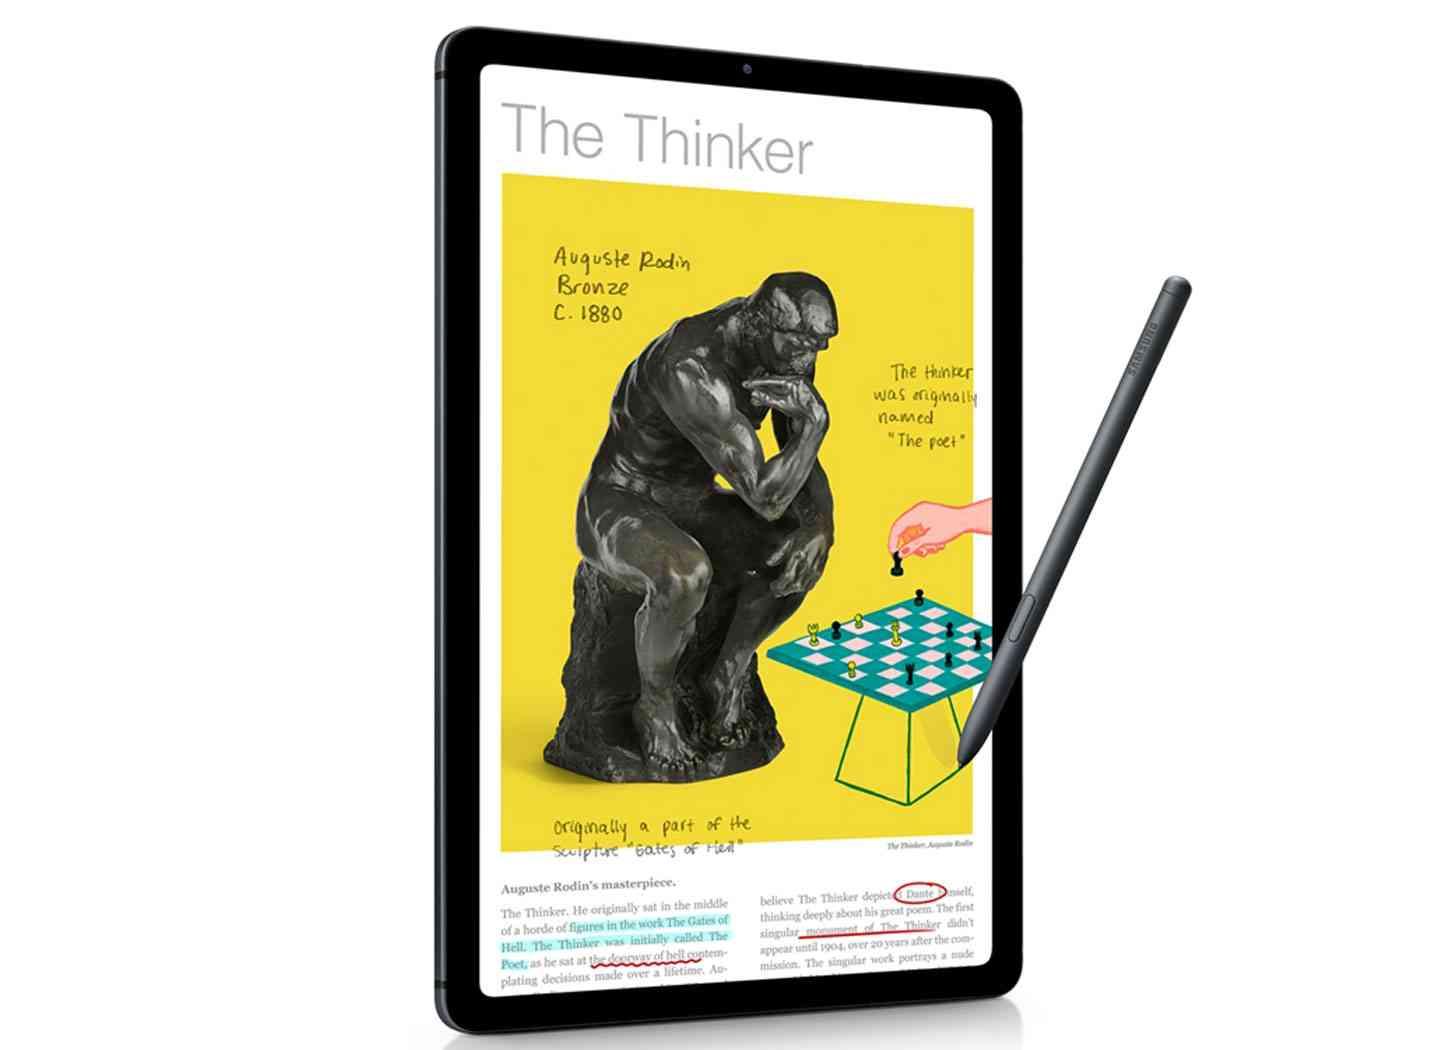 Samsung Galaxy Tab S6 Lite official